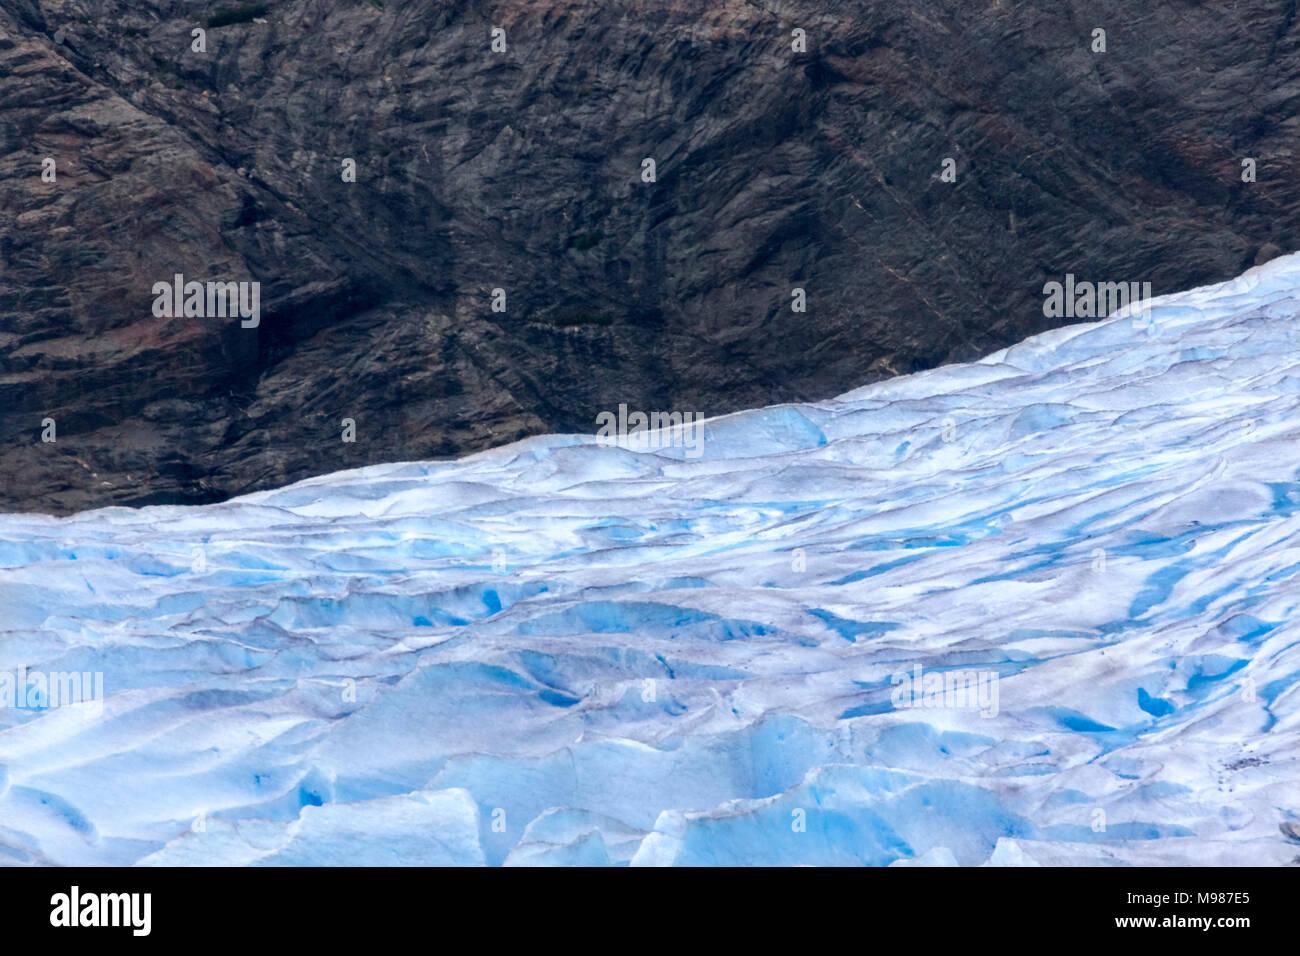 USA, Alaska, Juneau, Mendenhall glacier, rock - Stock Image